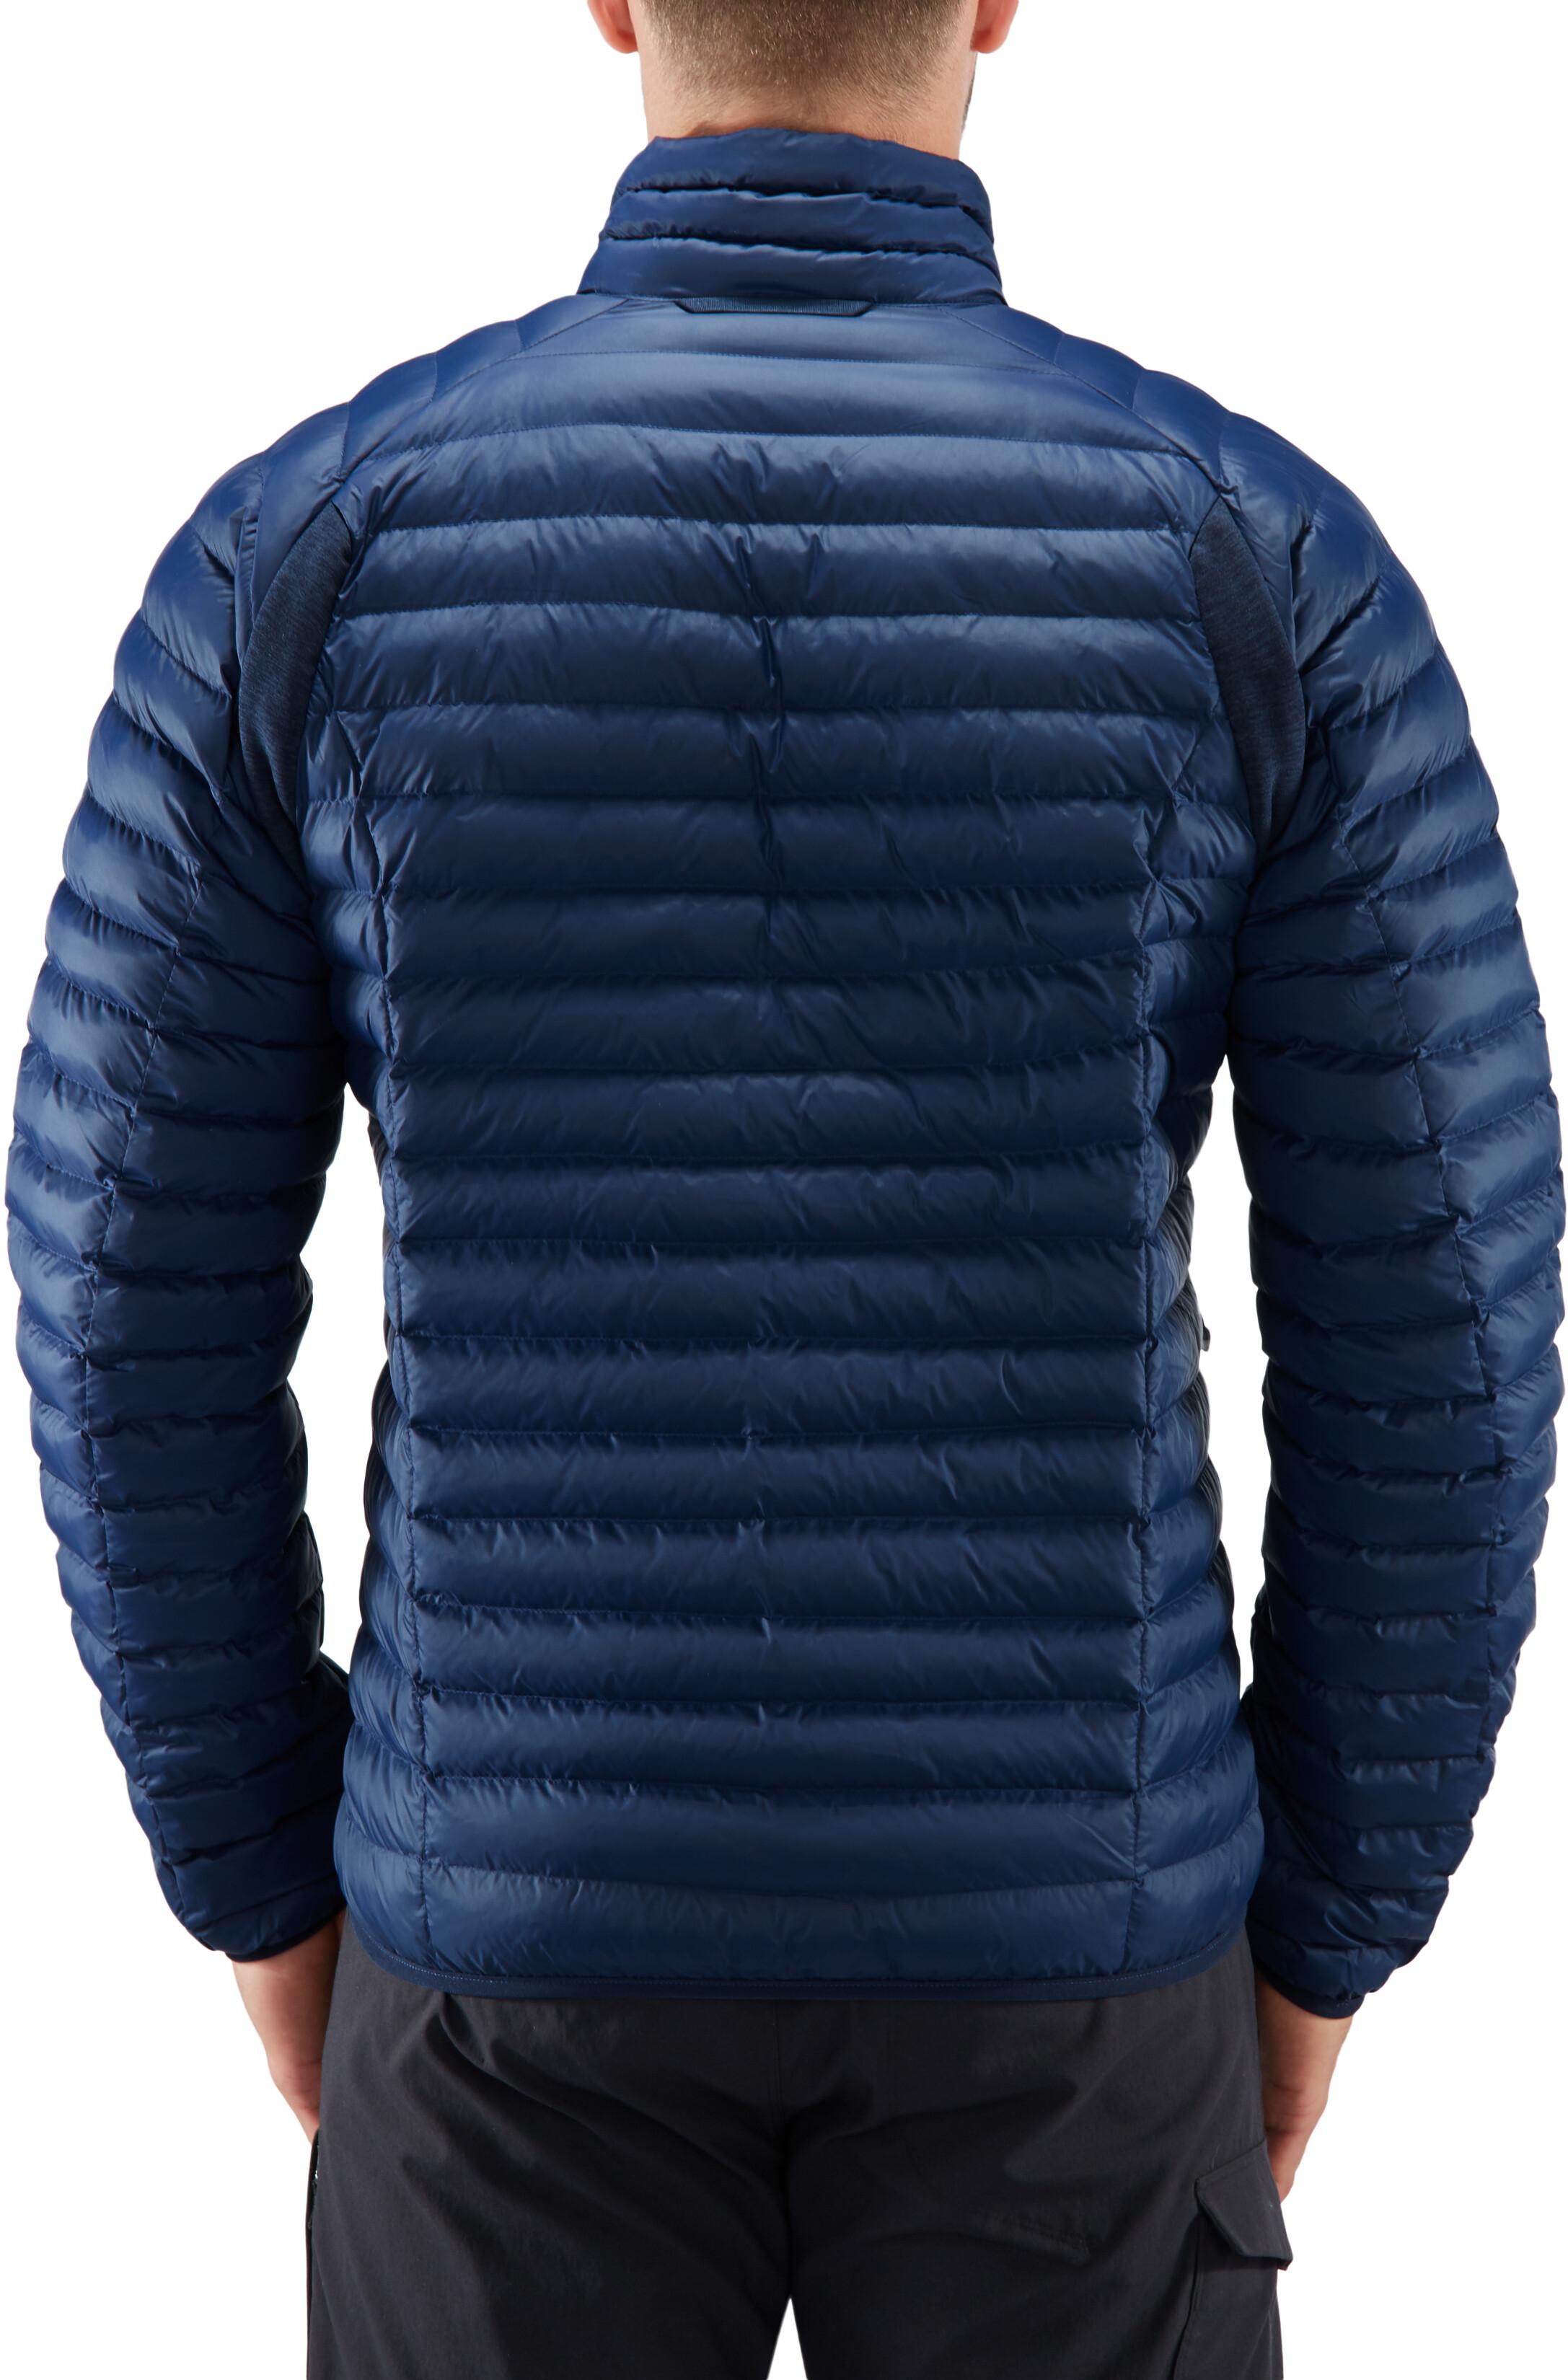 4a6491524d3 Haglöfs Essens Mimic Hood Jacket Men tarn blue at Addnature.co.uk